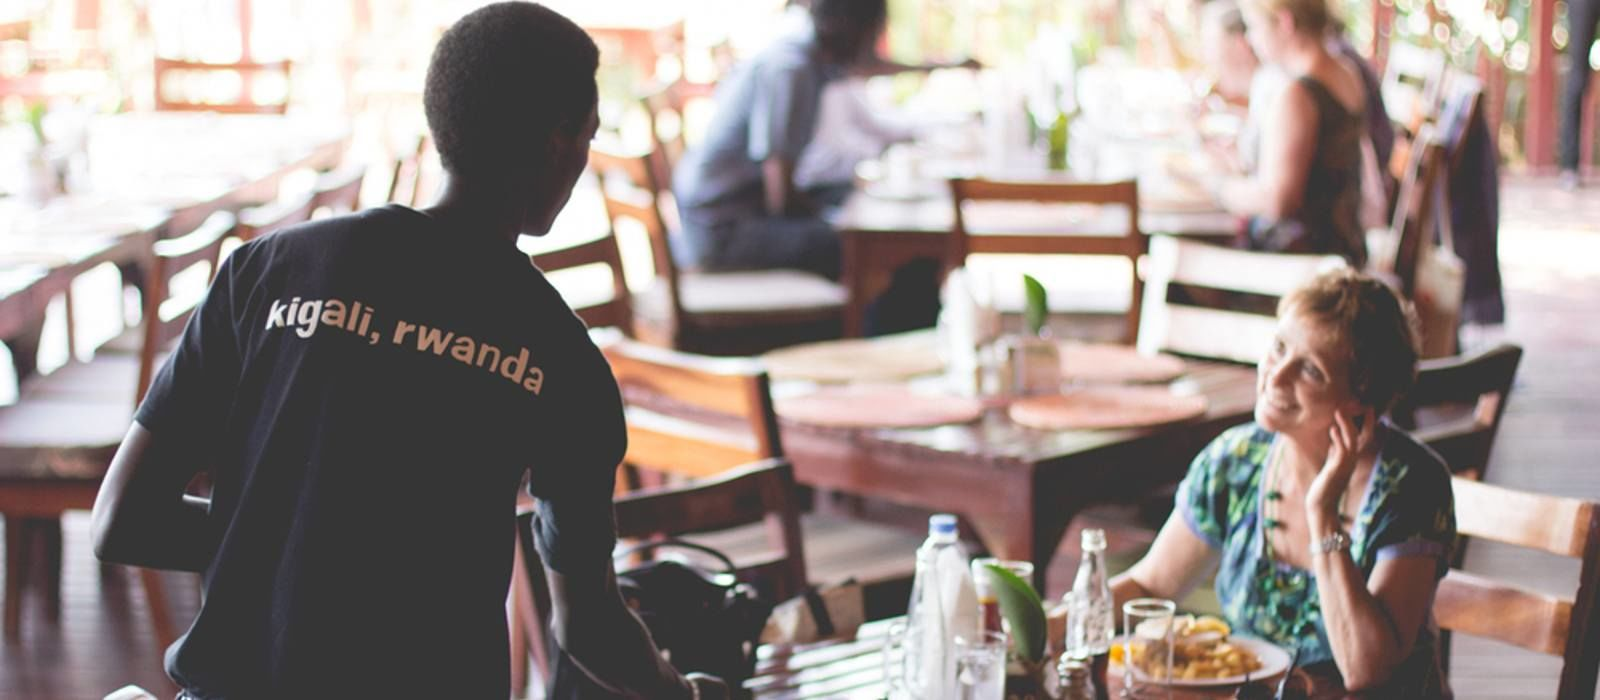 Heaven Rwanda in Kigali